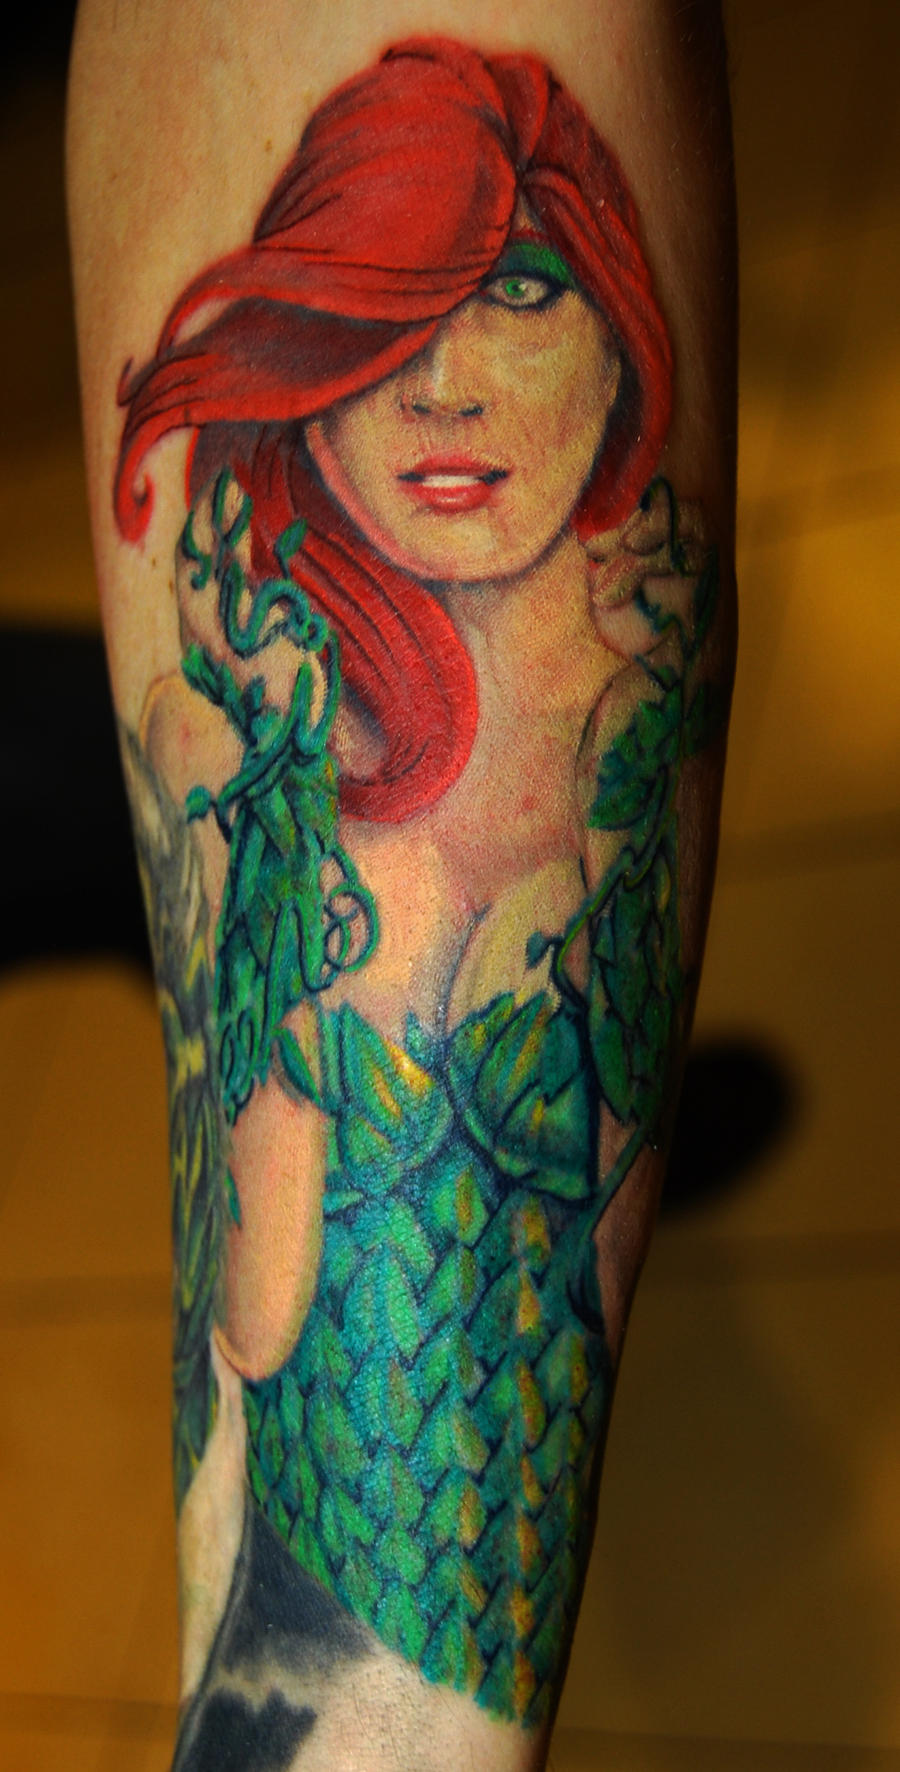 Back tattoo making jack skeleton tattoos for Poison ivy vine tattoos